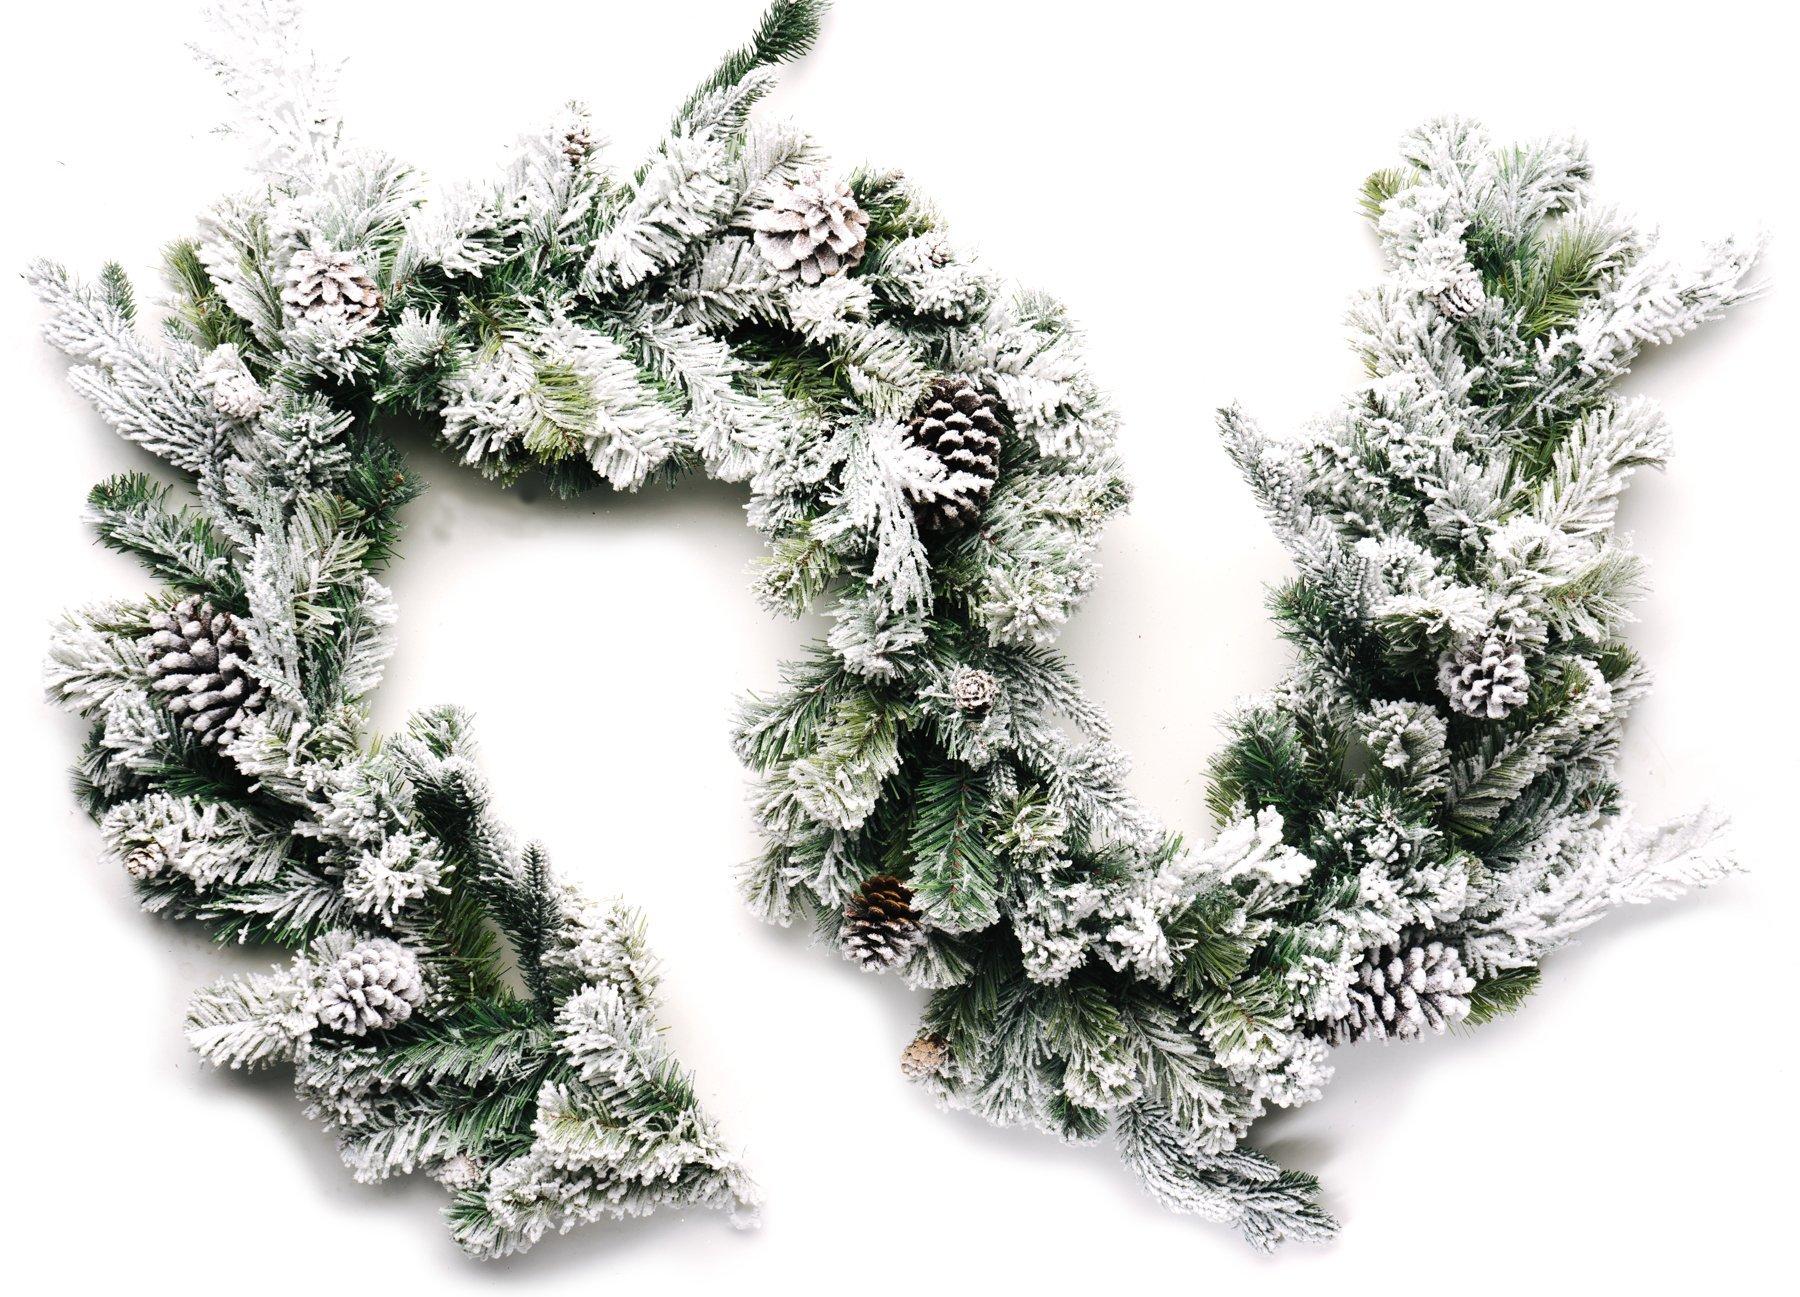 silk flower arrangements craftmore frosted forest pine garland 6 feet